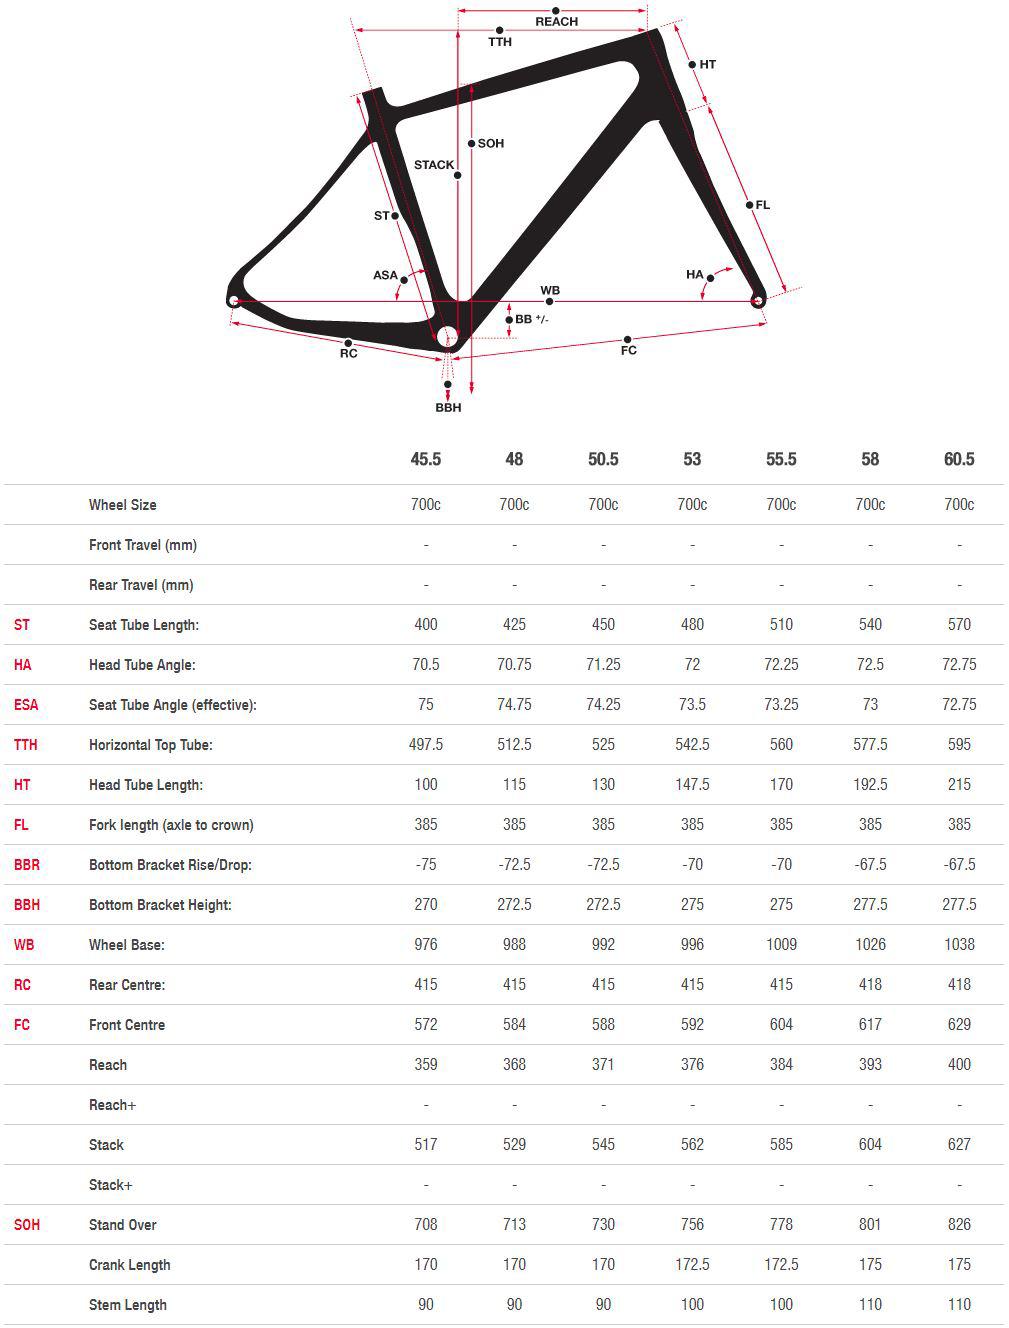 Valence Disc C geometry chart